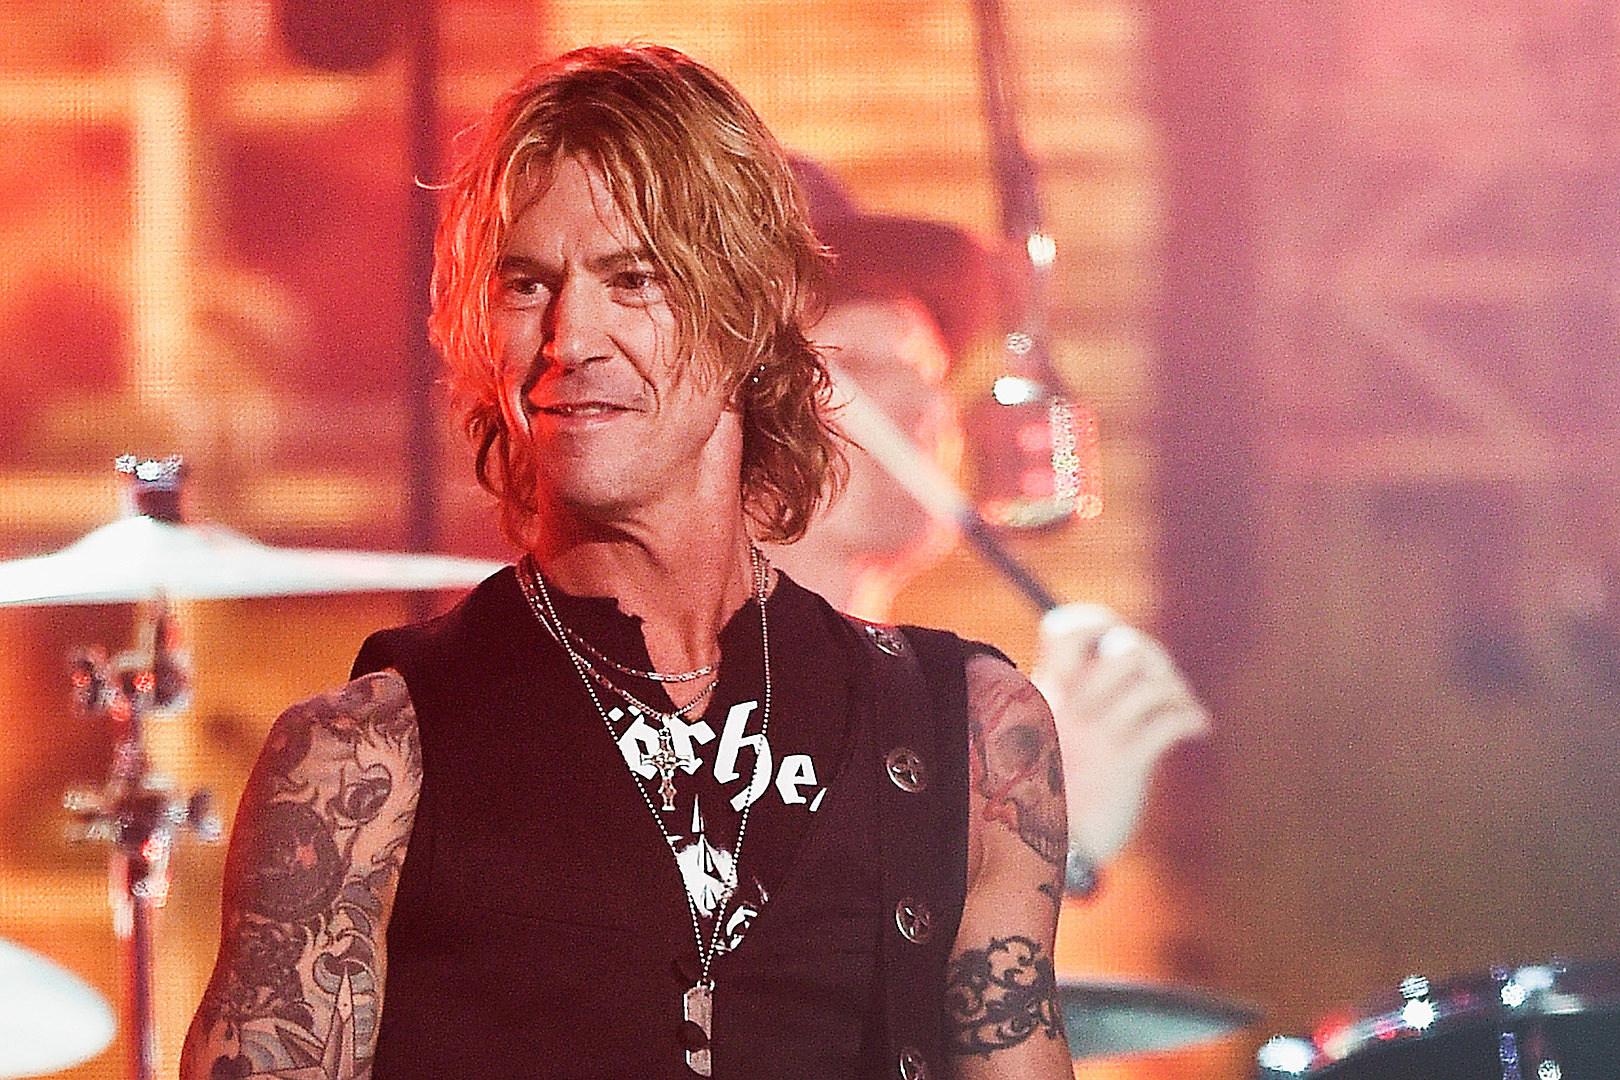 Guns N' Roses' Duff McKagan Releases New Song 'Tenderness'